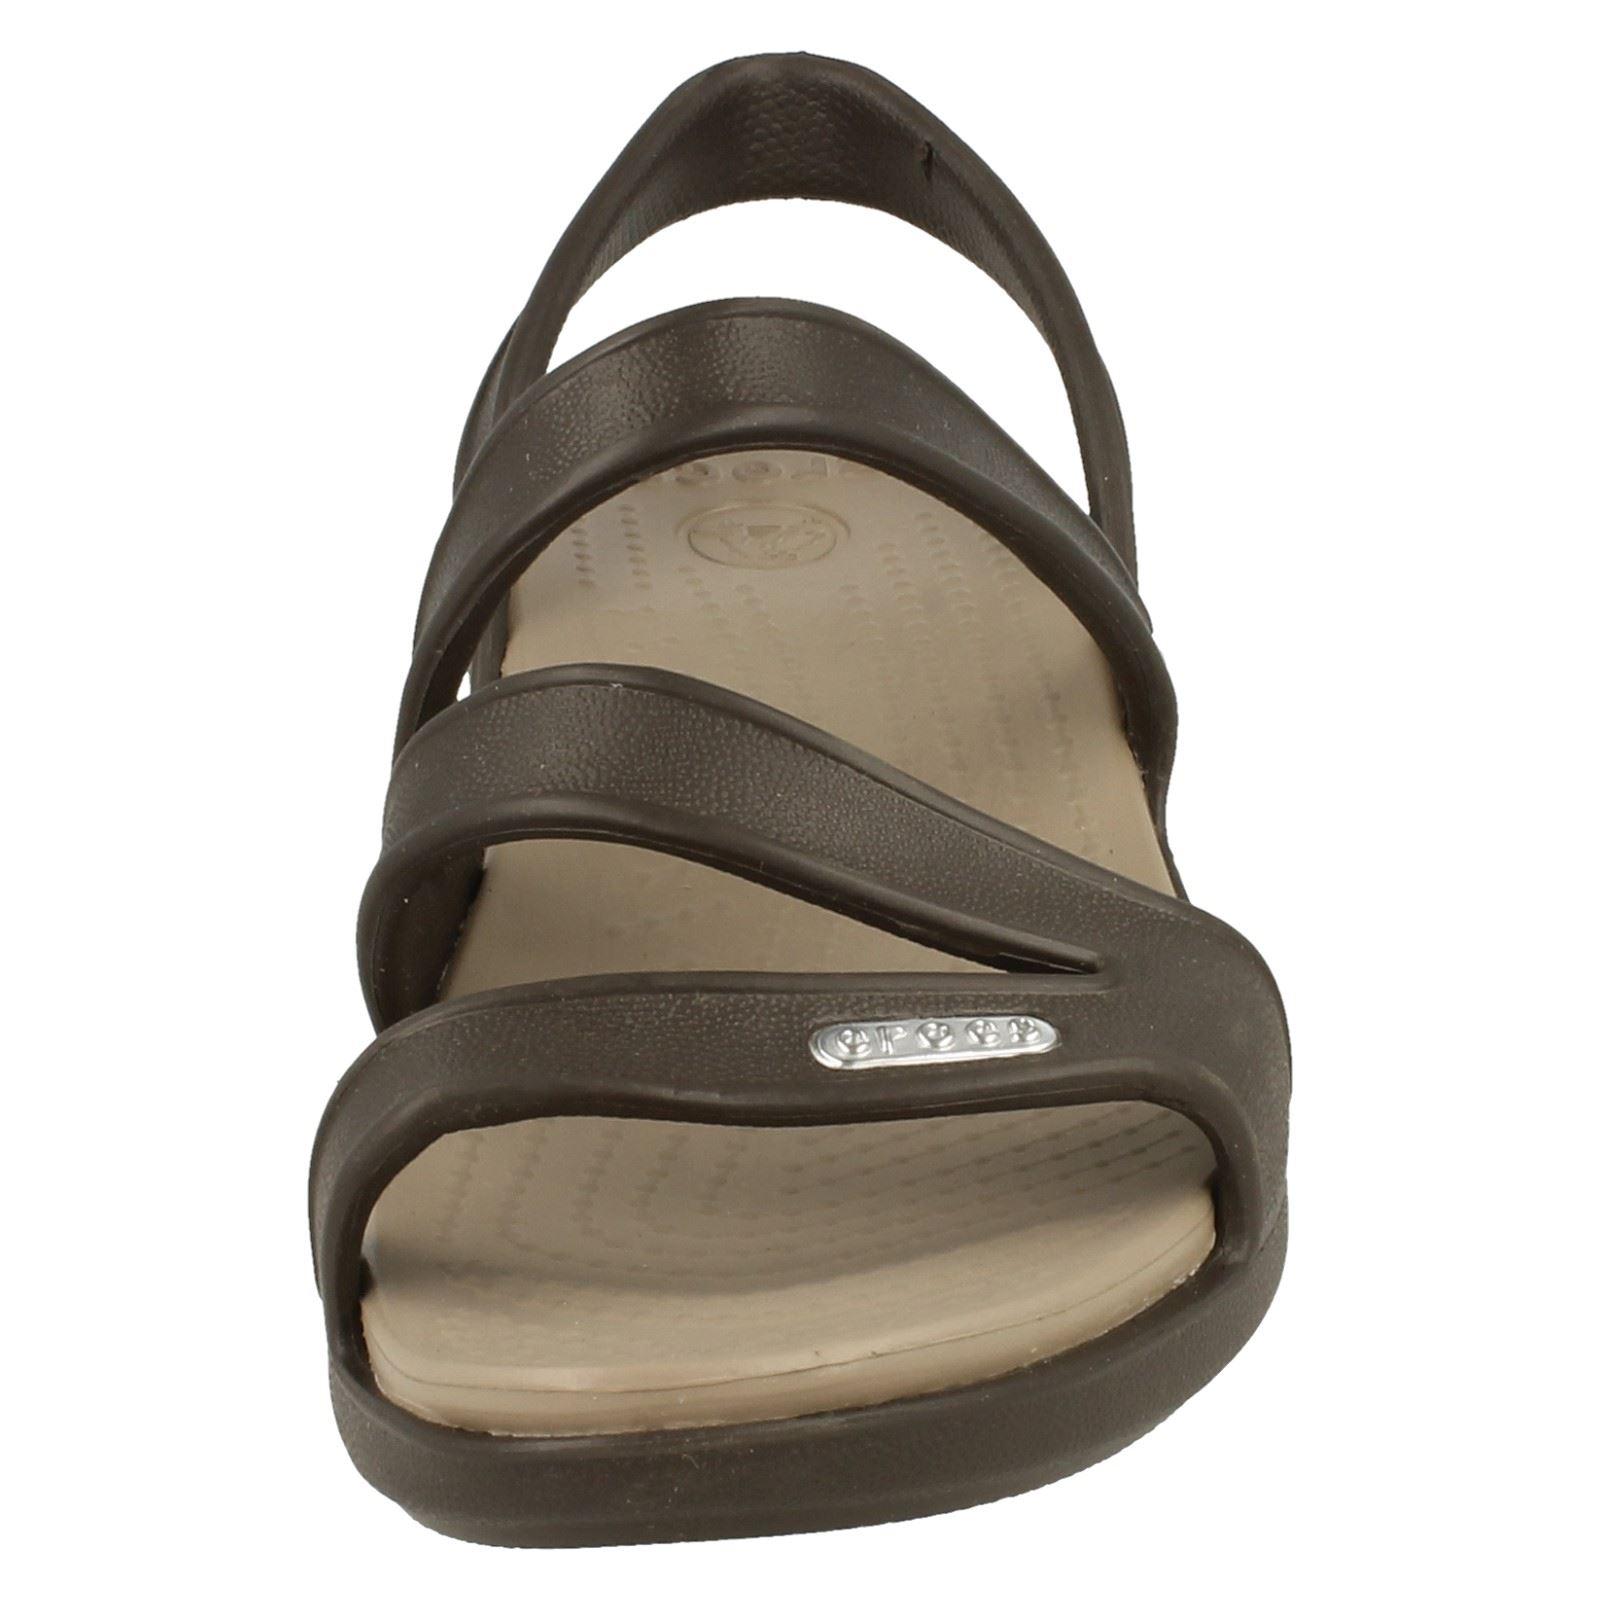 Crocs-Ladies-Strappy-Sandal-Patricia-Wedge-Sandal-W